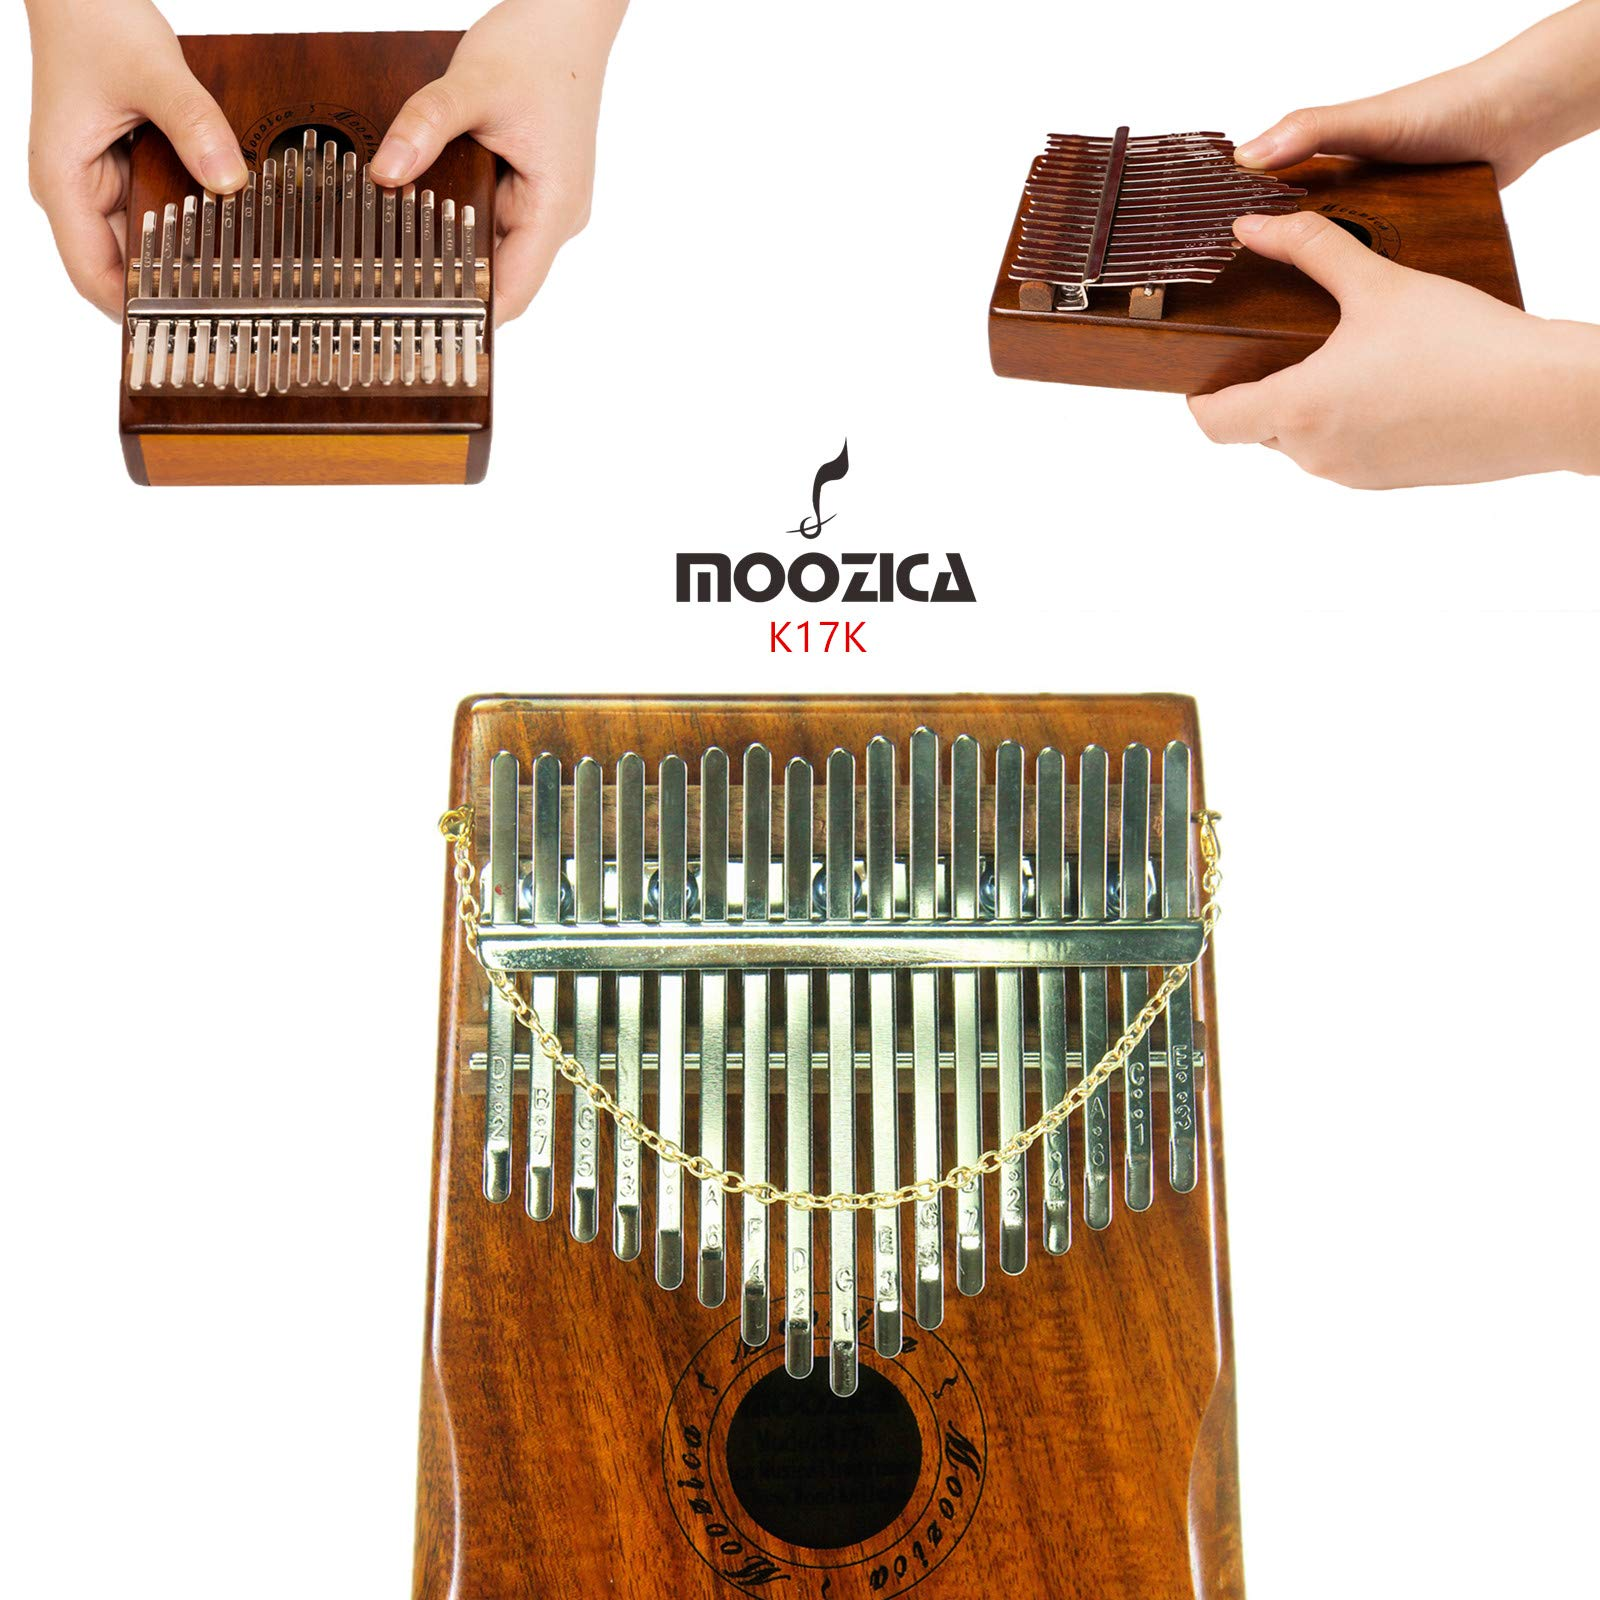 Moozica 17 Keys Kalimba Marimba, Professional Thumb Piano Sanza Mbira Musical Instrument Gift (Koa - K17K) by Moozica (Image #2)